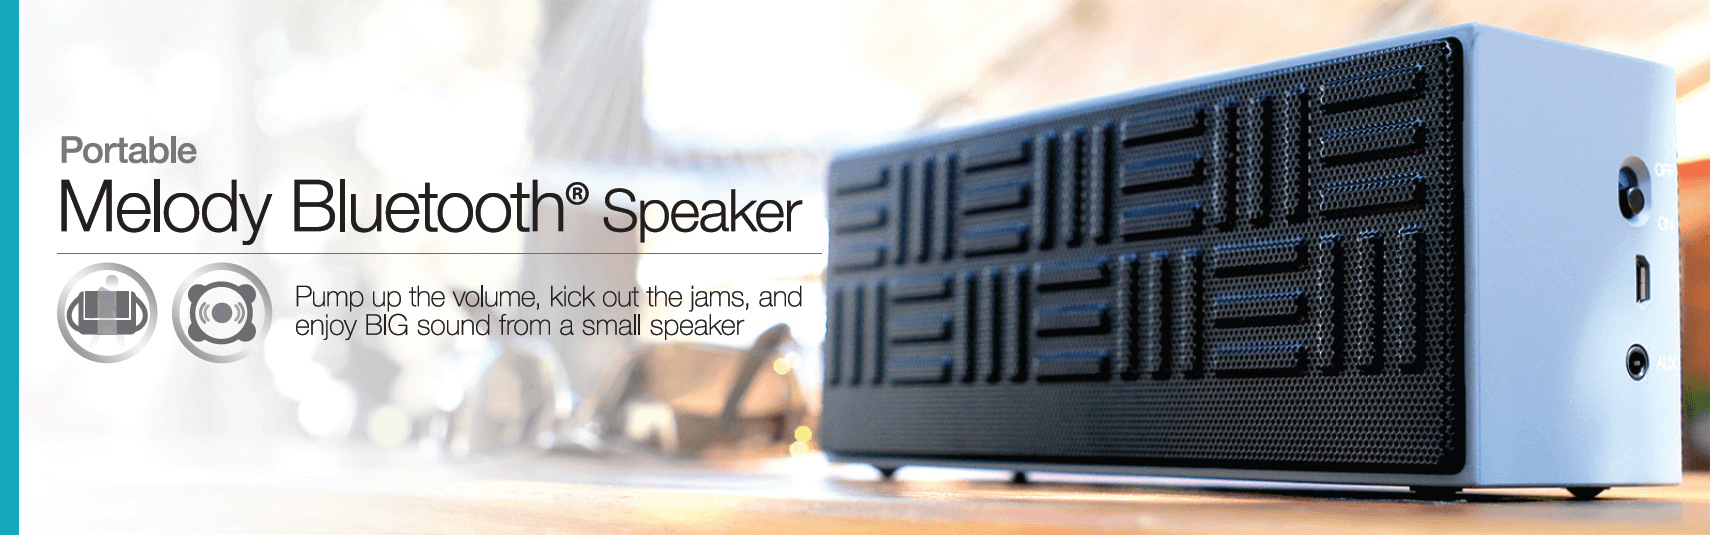 Melody Bluetooth Speaker